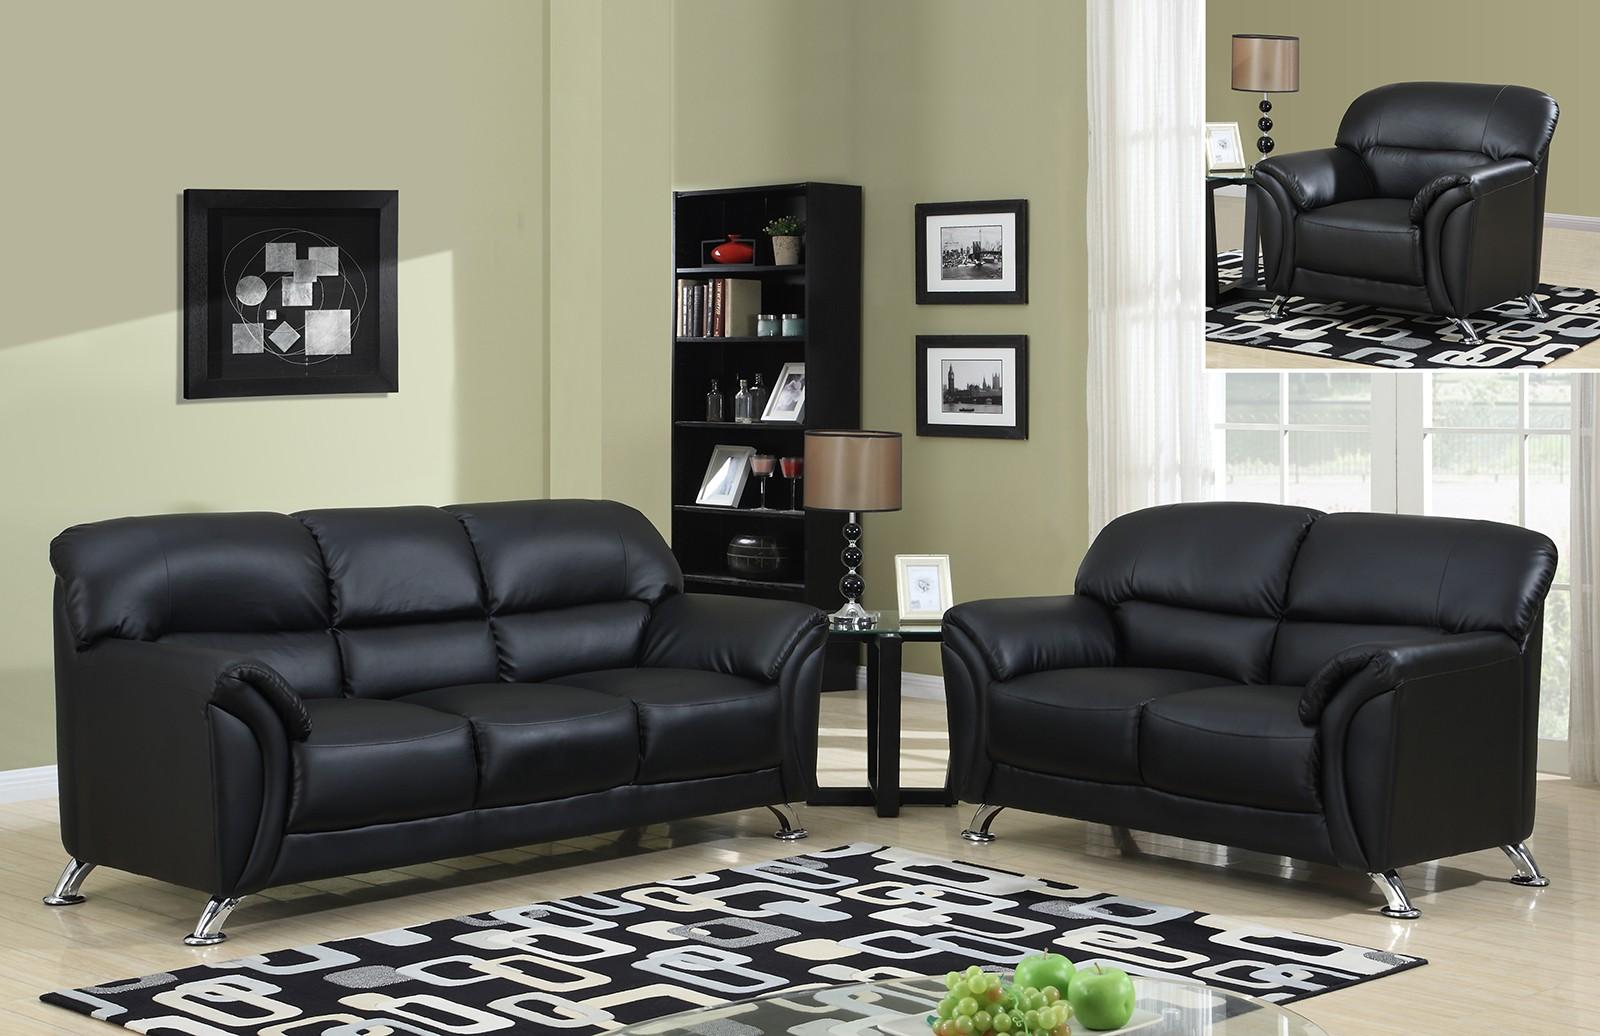 Global Furniture USA Global Furniture U9103 3-Piece Living Room Set ...